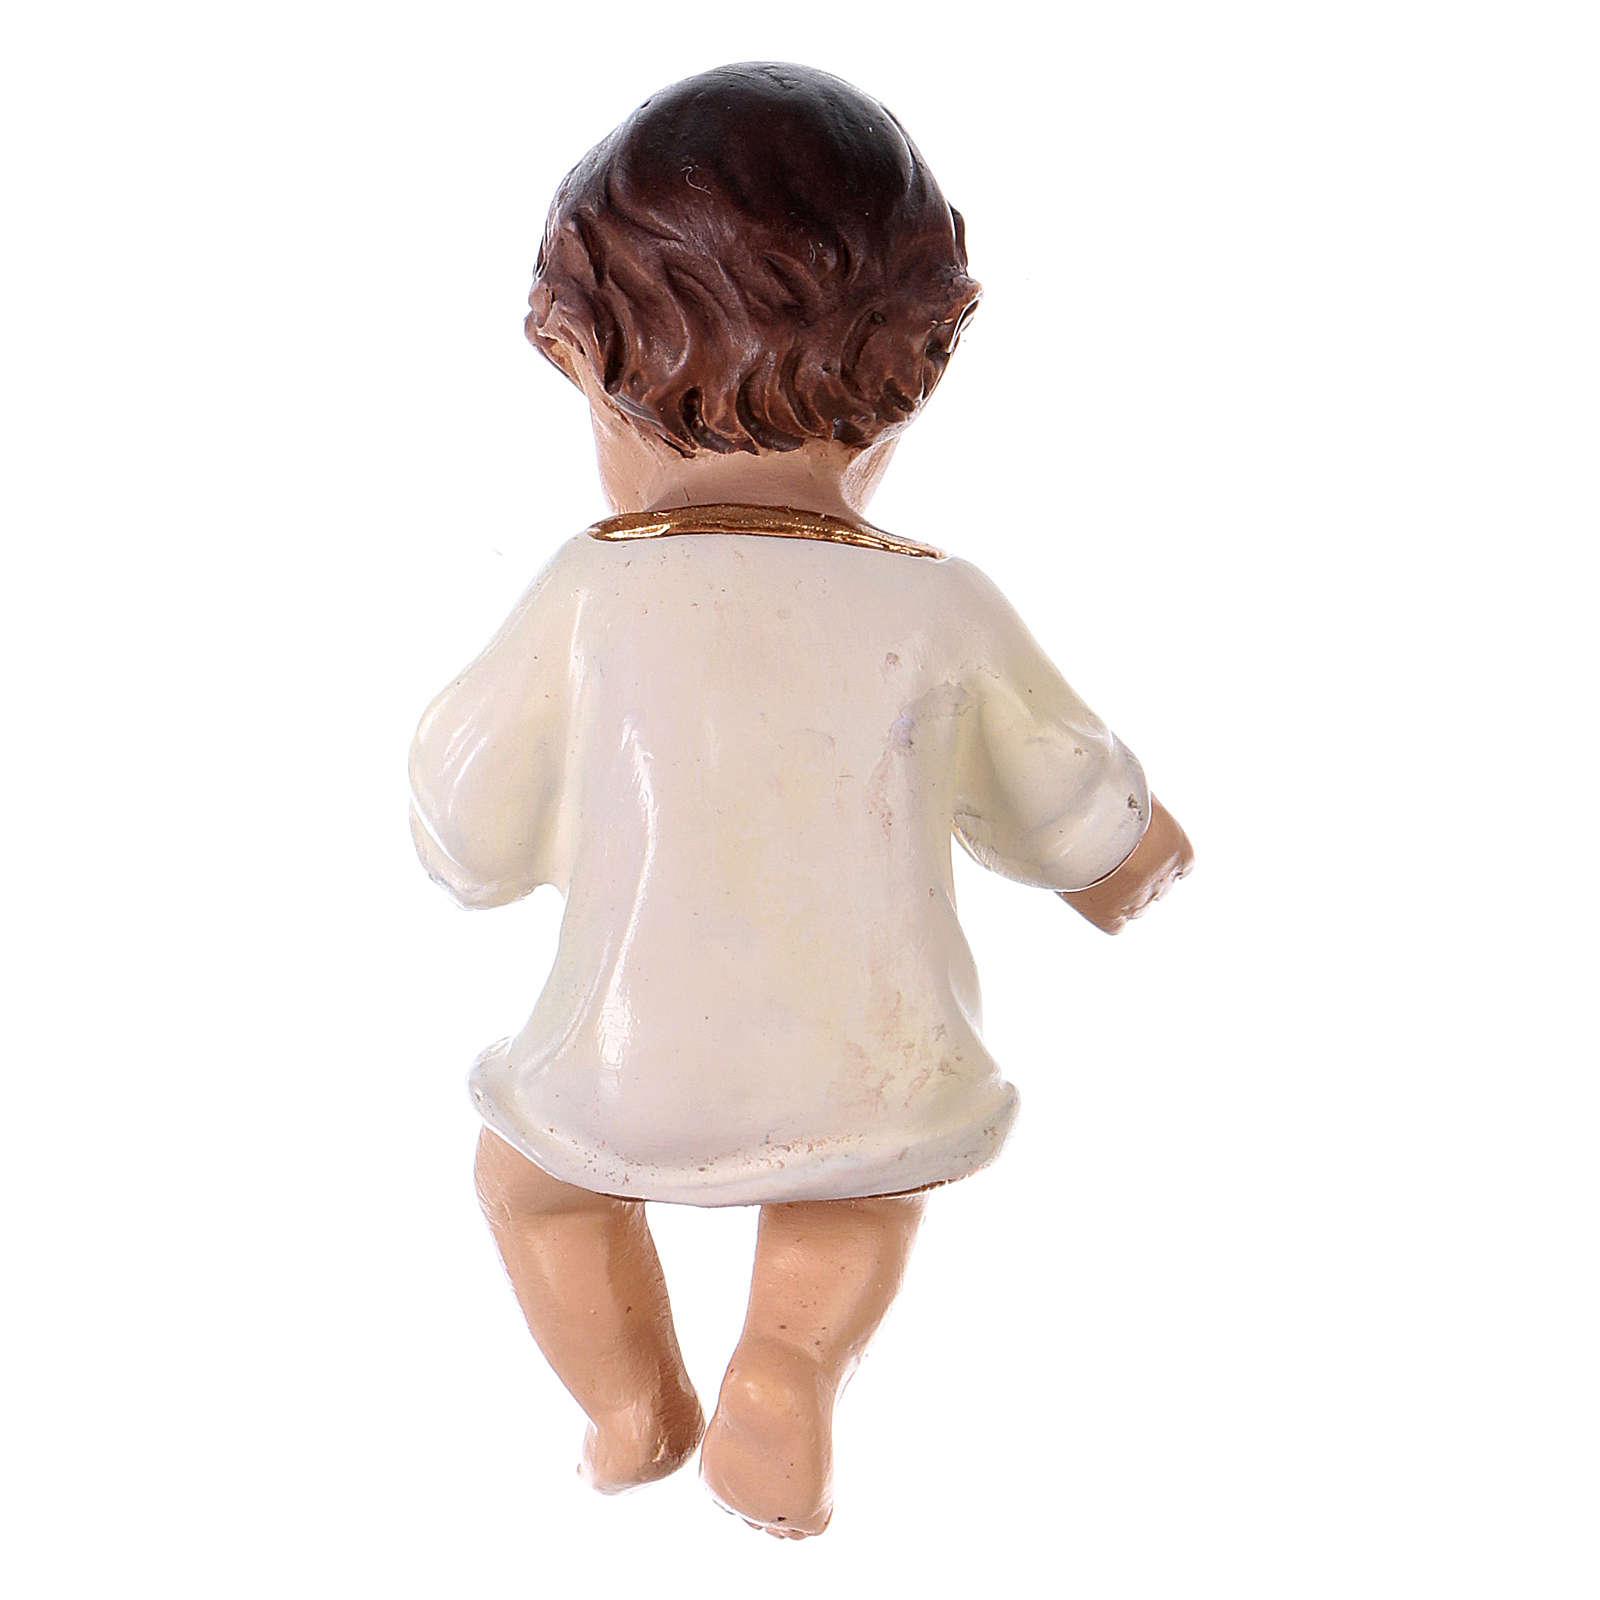 Gesù bambino h reale 6,5 cm resina 3